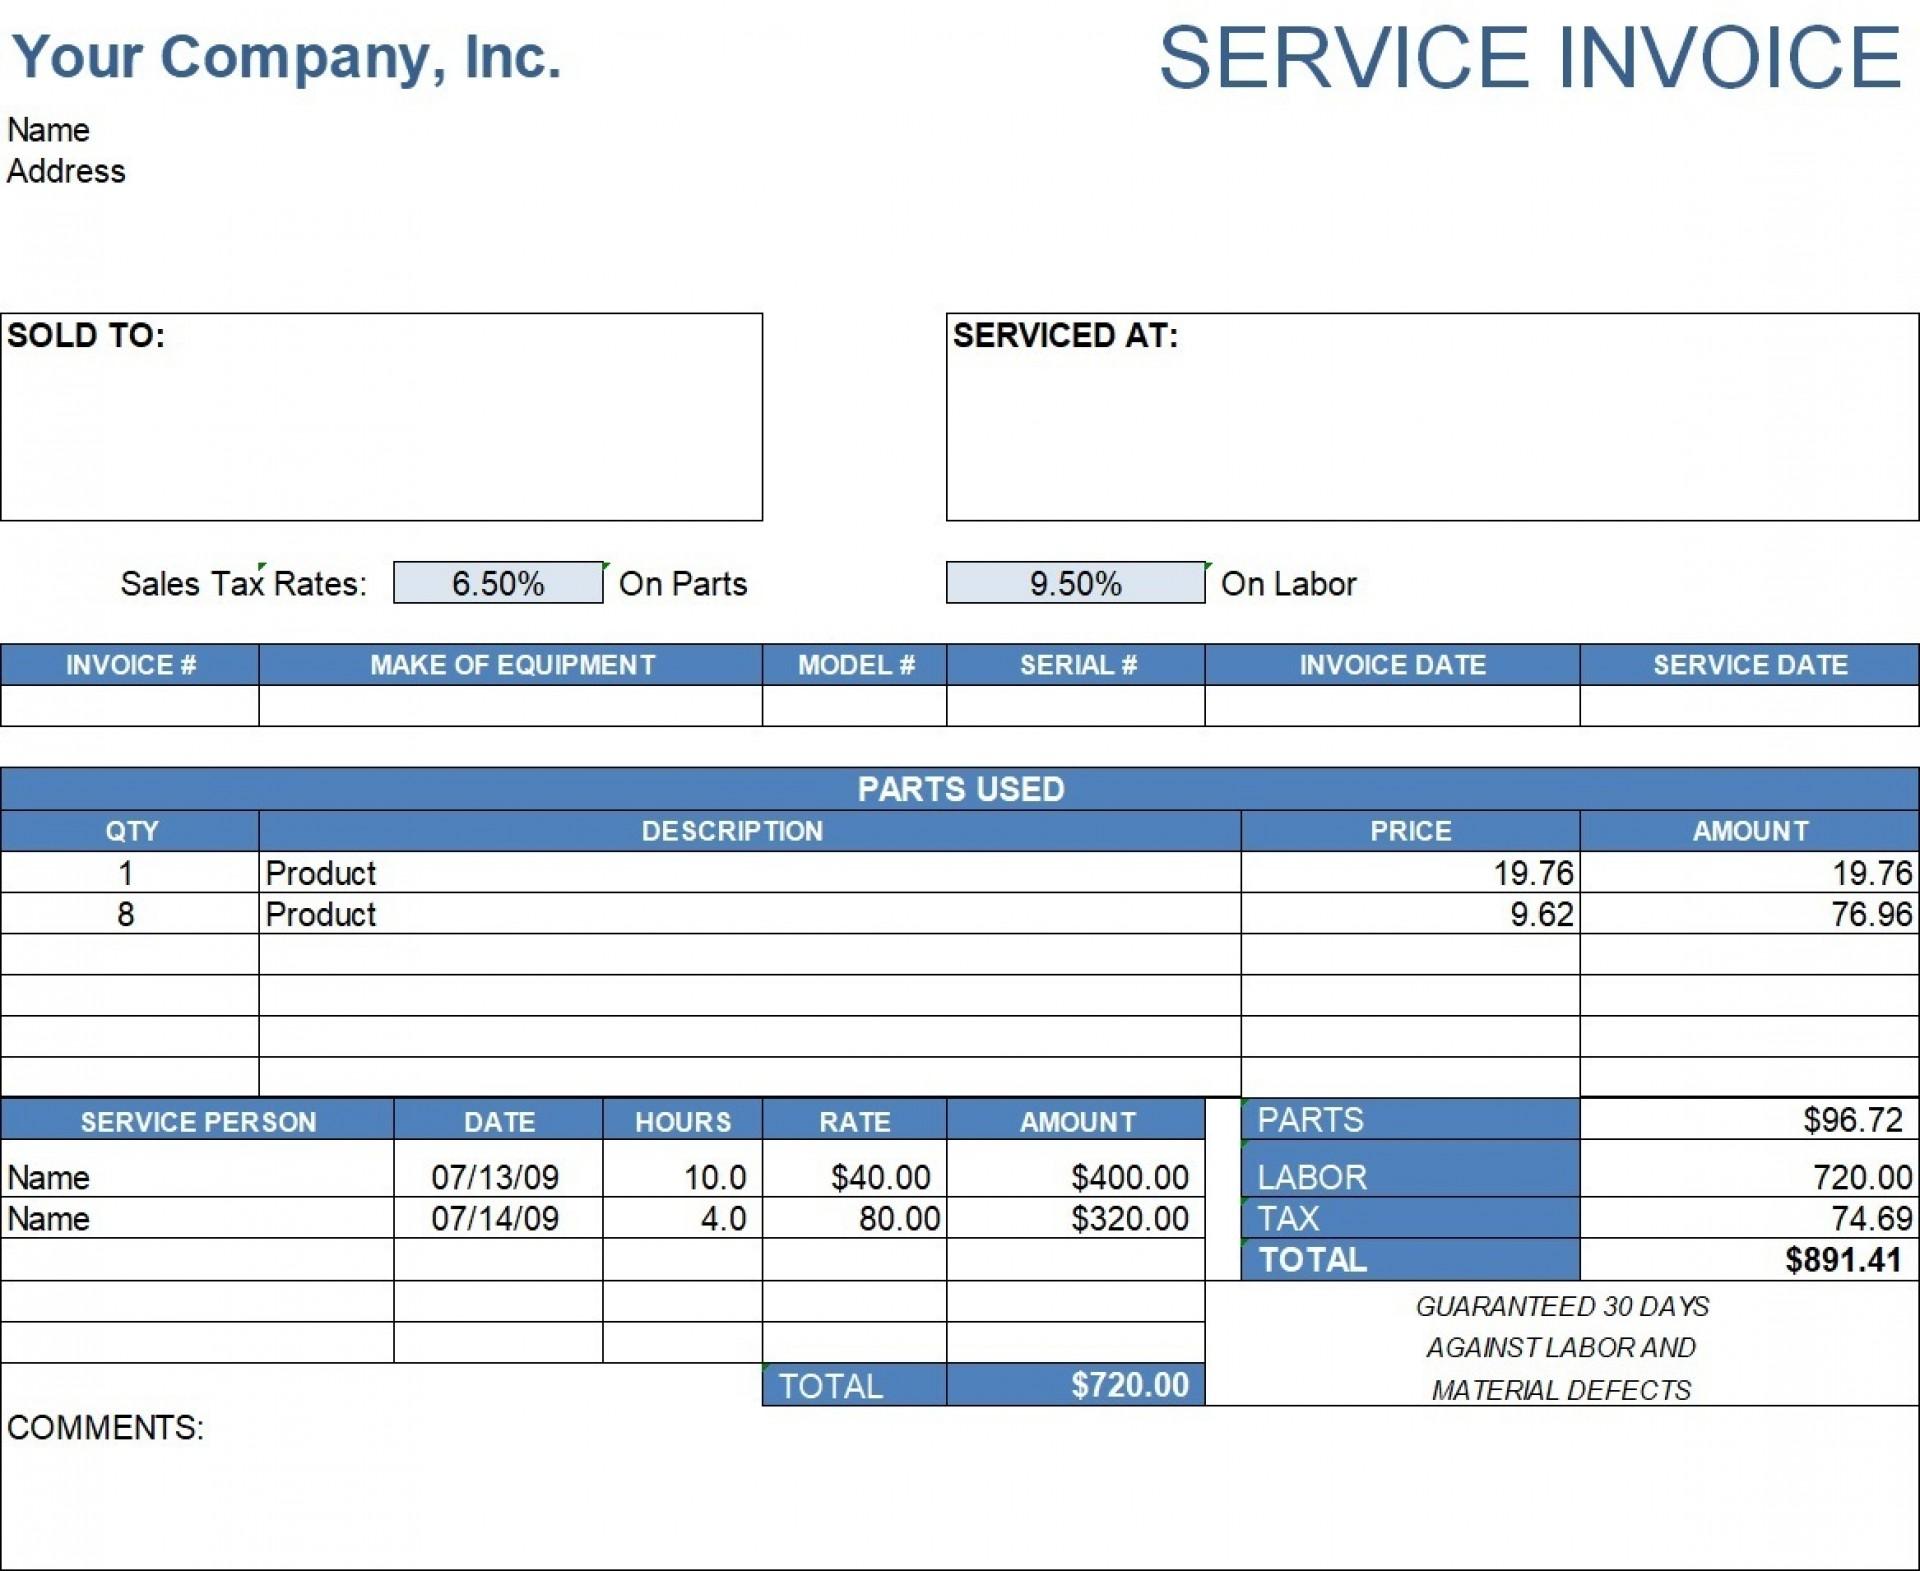 002 Impressive Free Excell Invoice Template Sample  Excel Gst India Canada Tax Australia1920